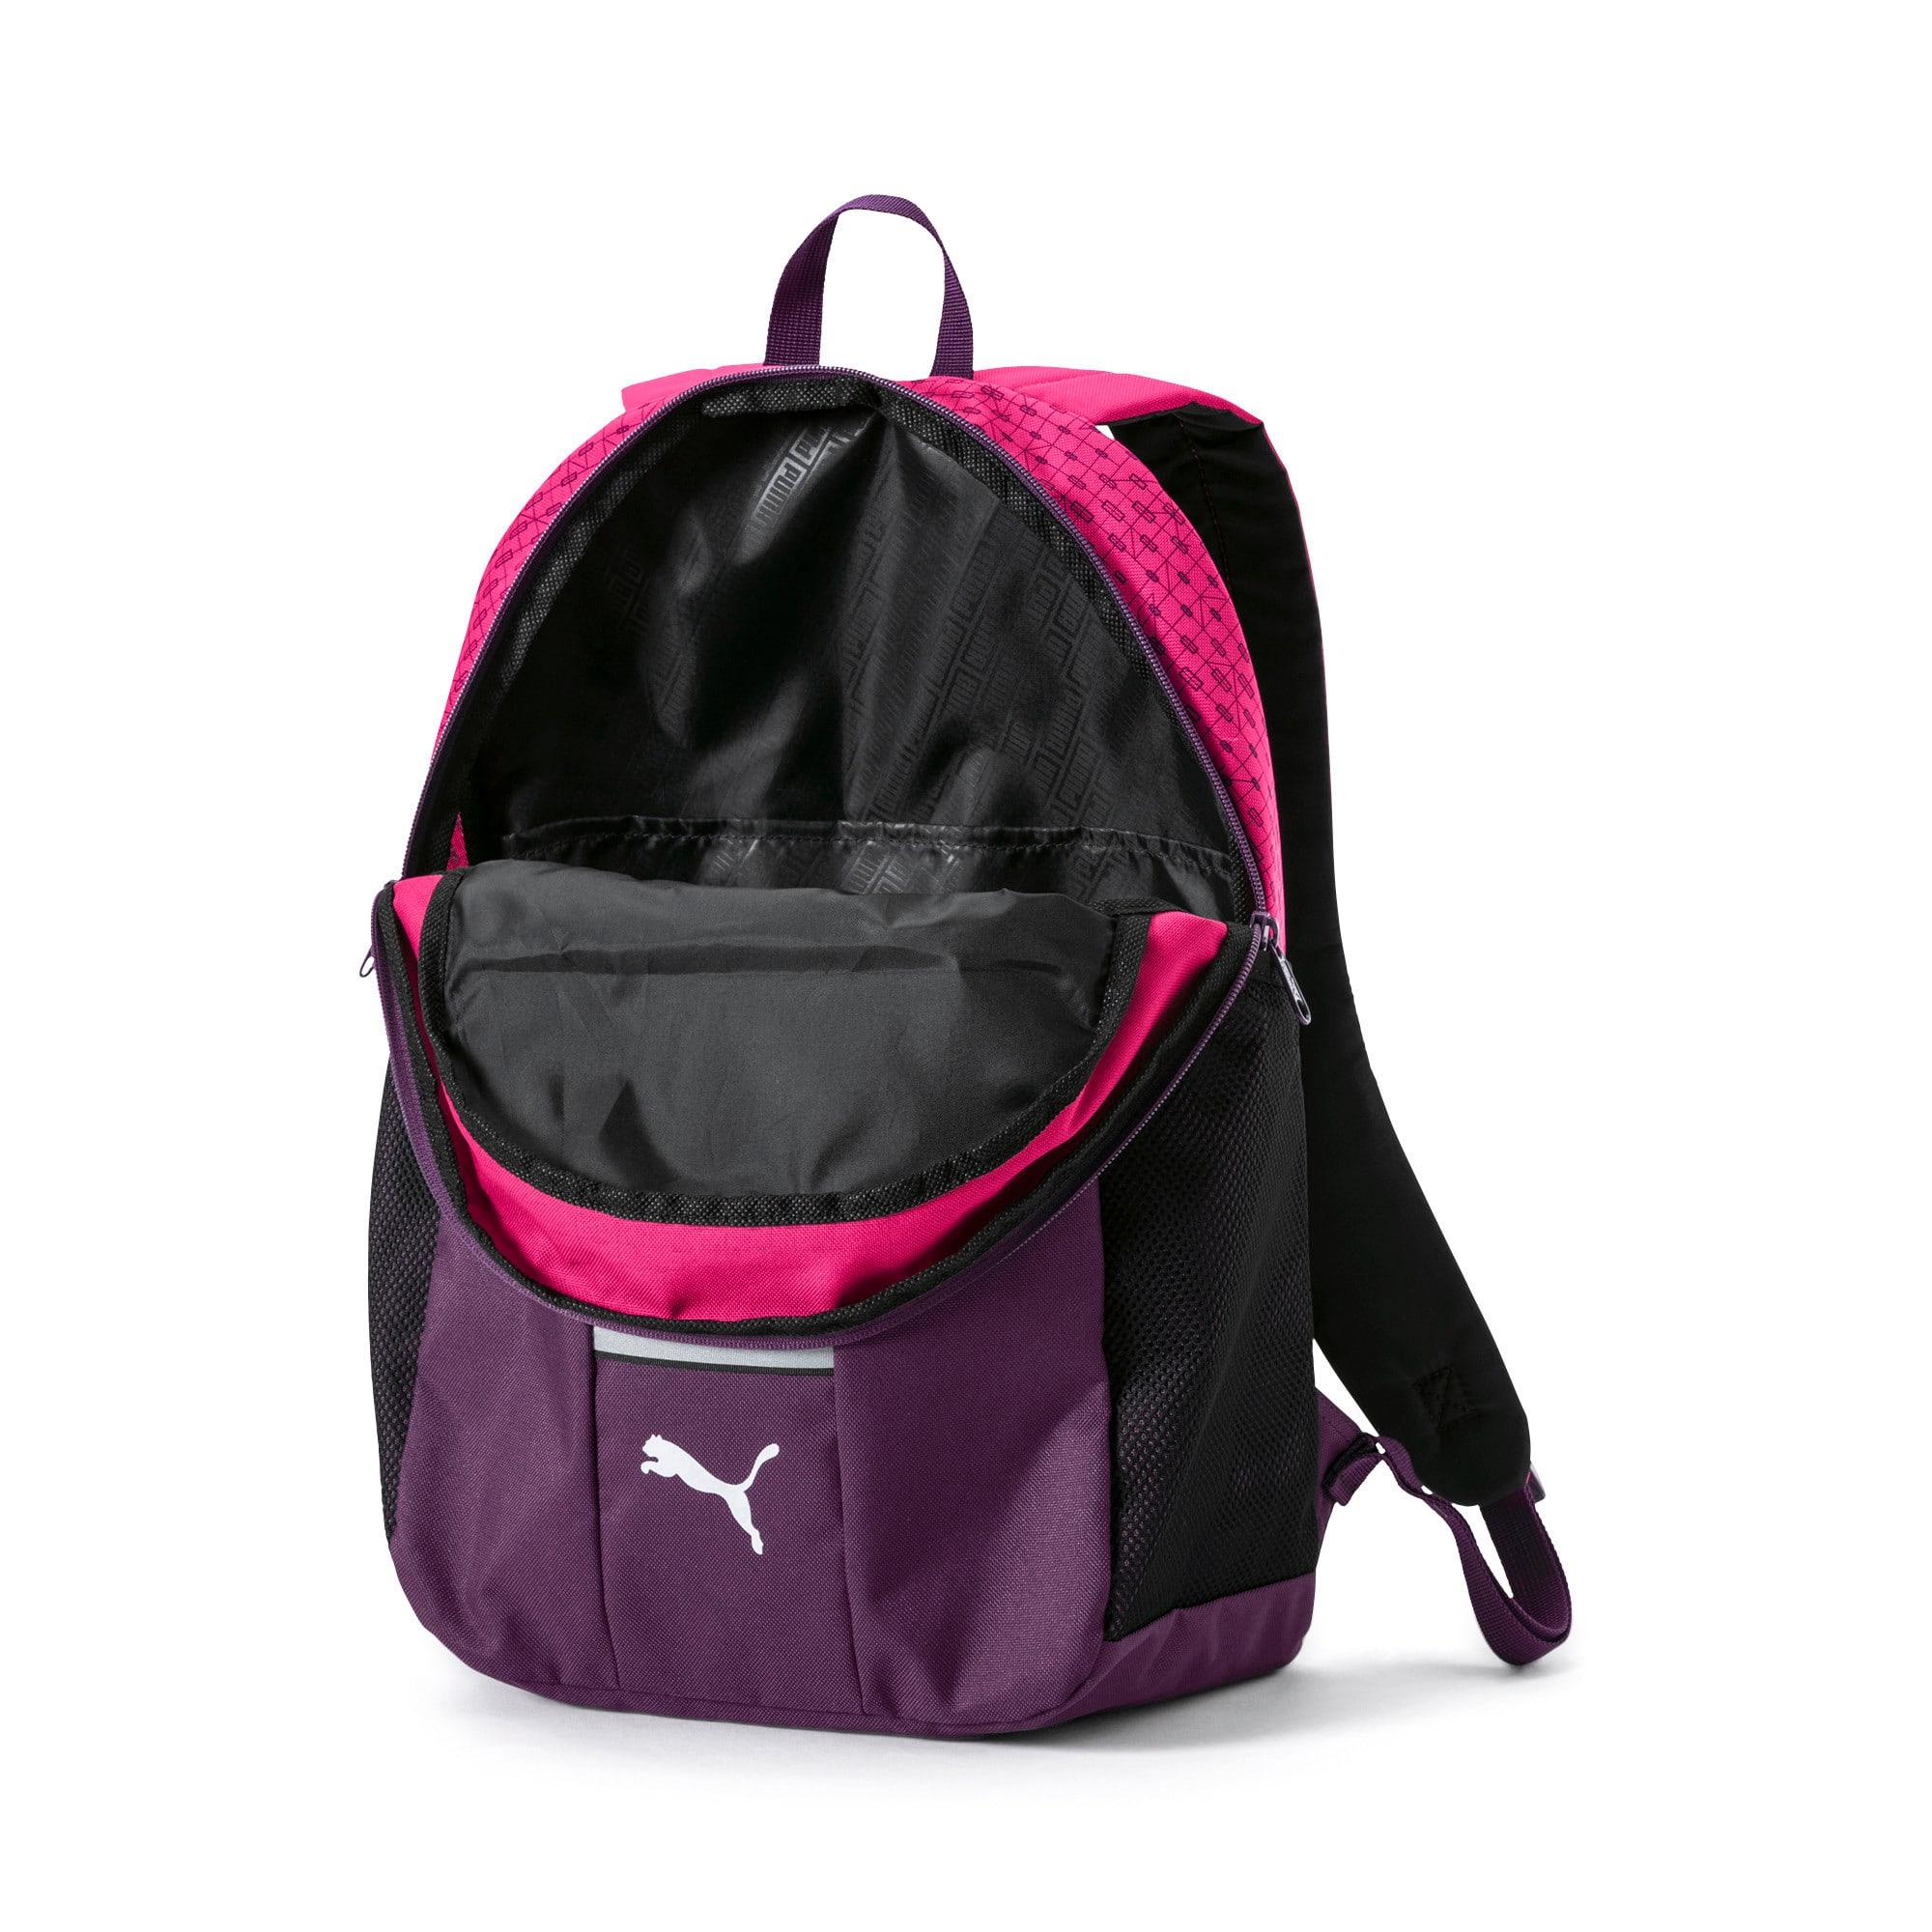 Thumbnail 3 of Beta Backpack, Beetroot Purple-Shadow Purpl, medium-IND